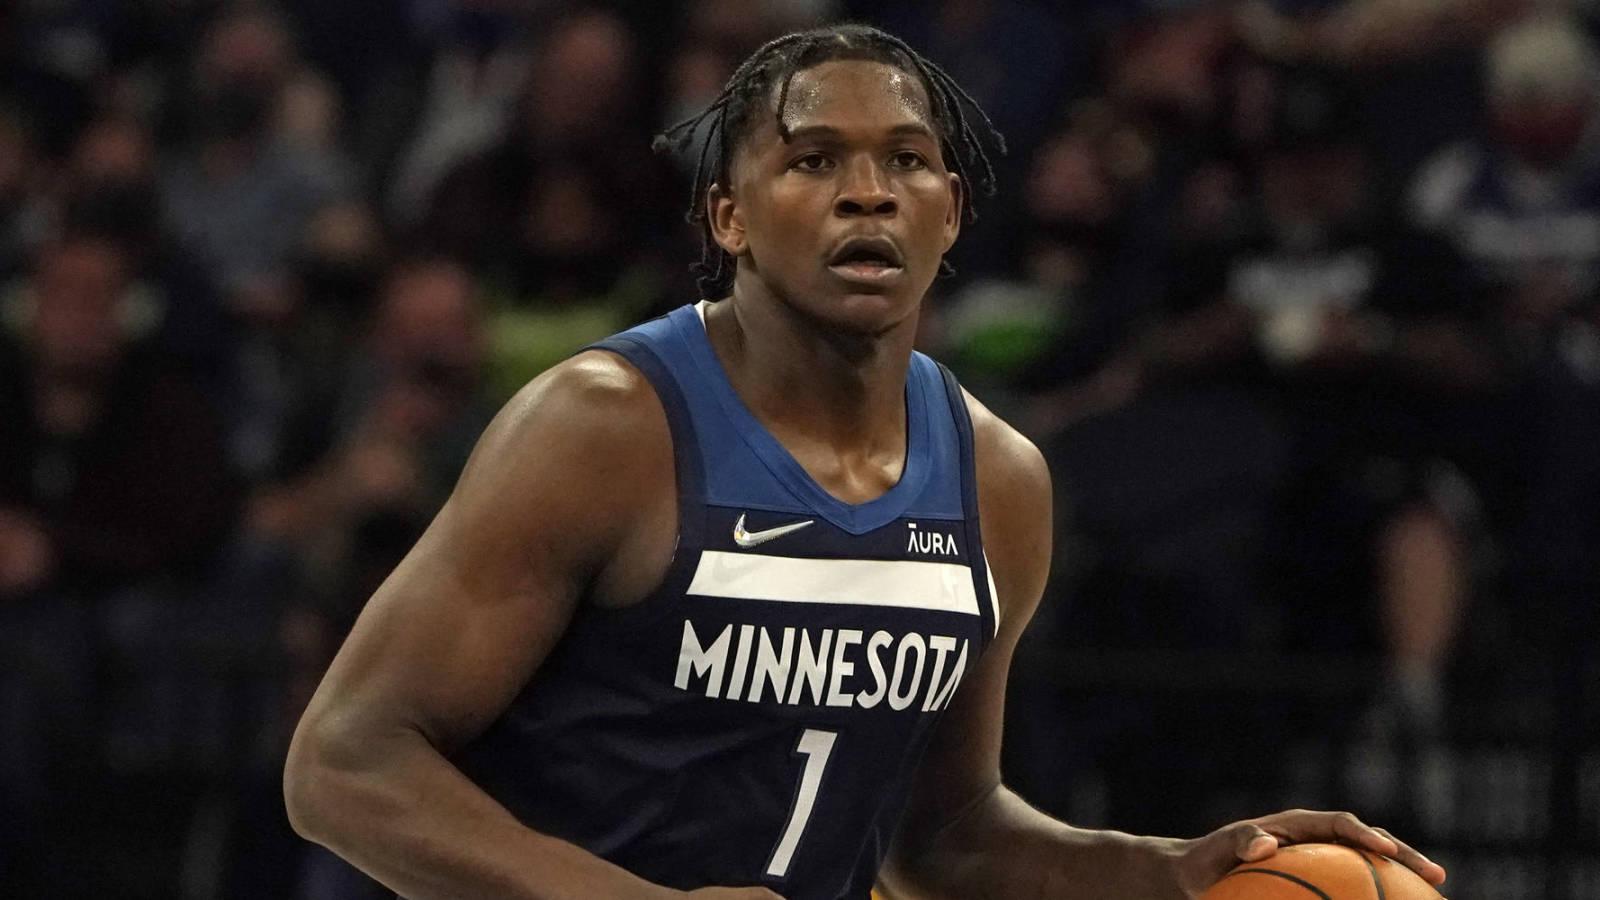 Reviewing the Minnesota Timberwolves' offseason